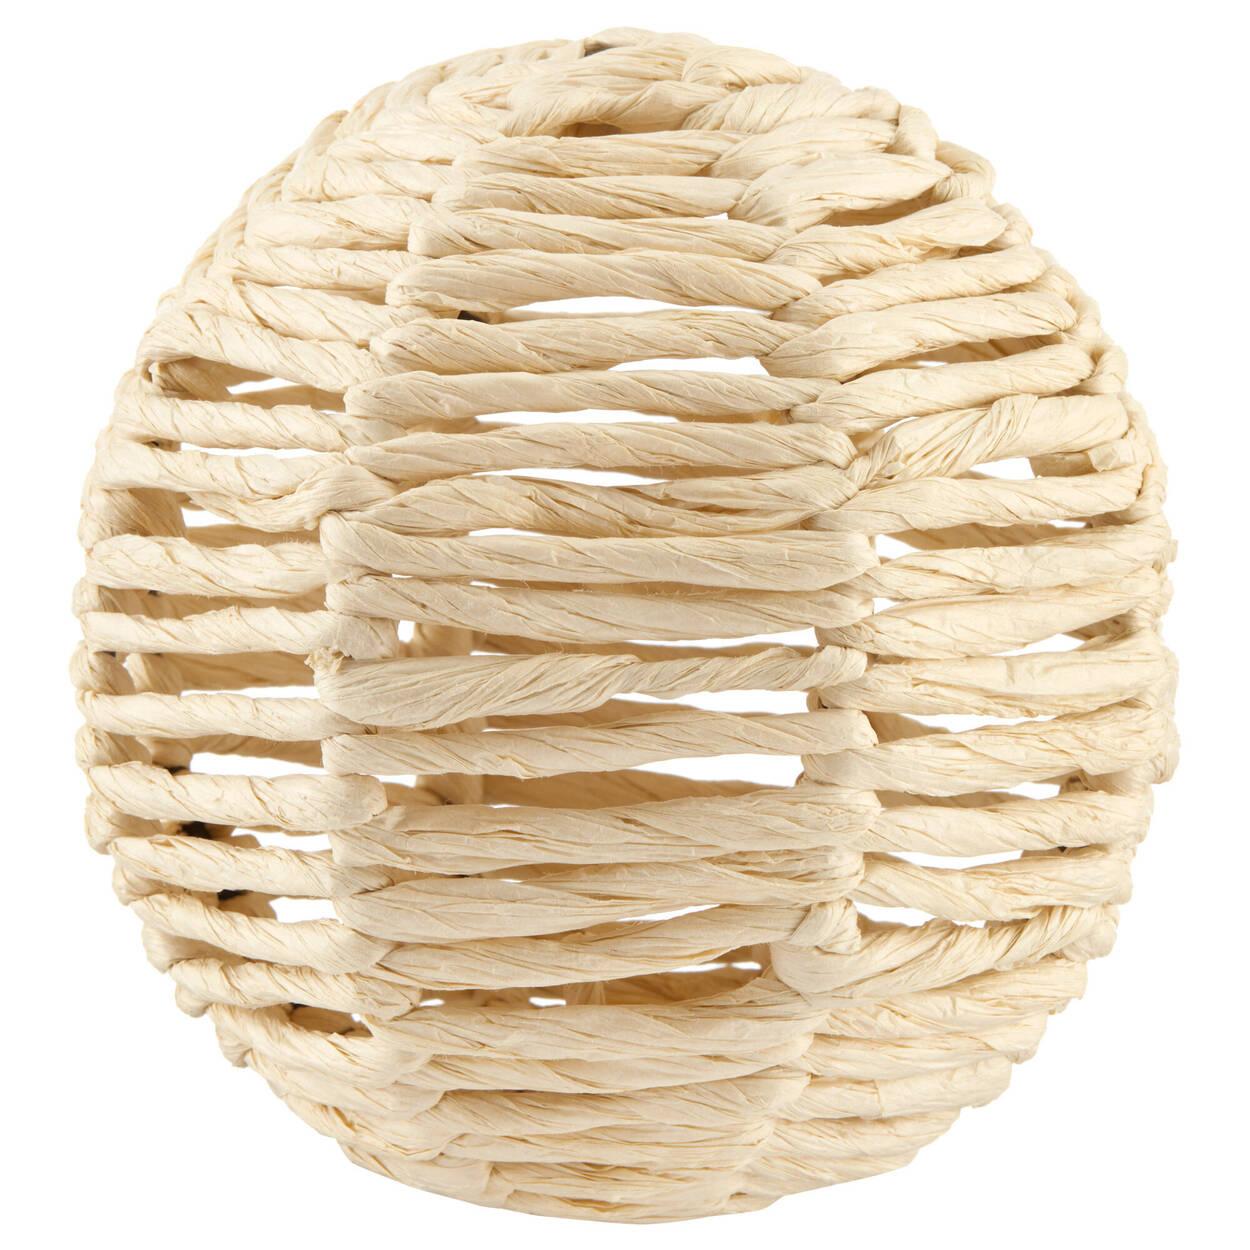 Decorative Natural Rope Ball